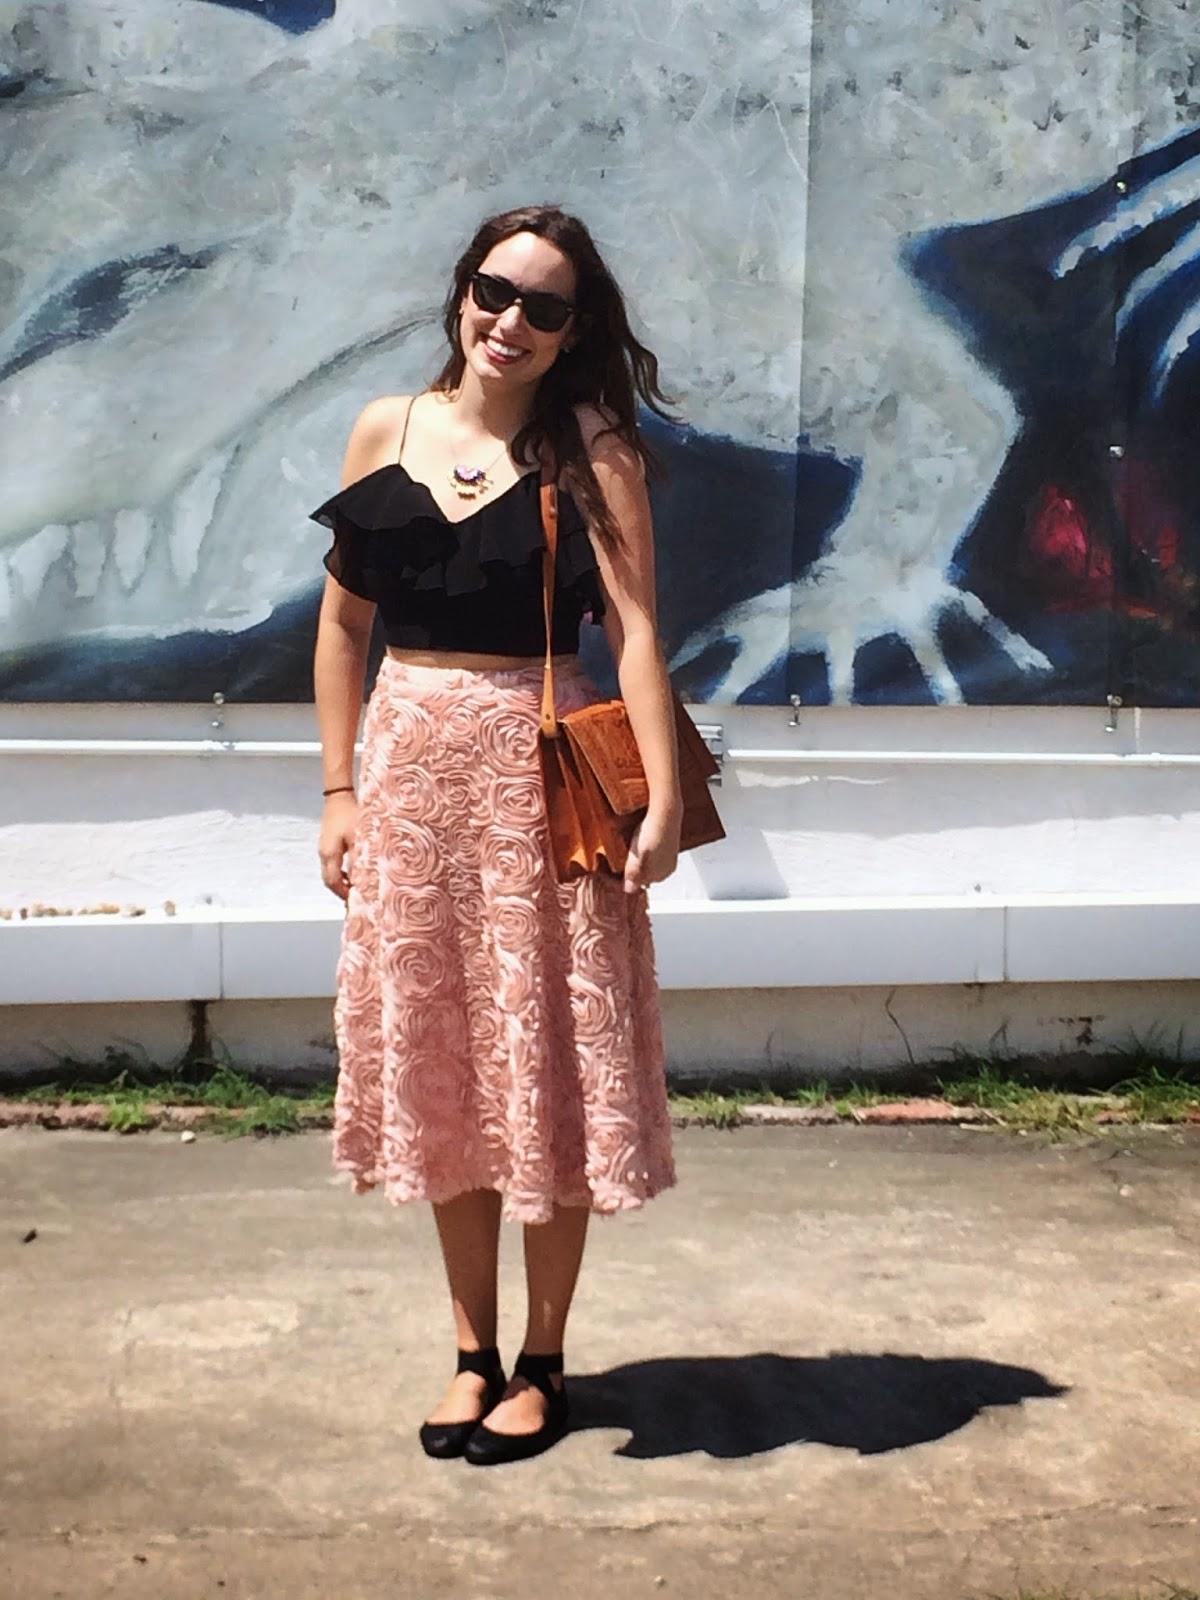 Anthropologie Petaluma Midi Skirt, Anthropologie Pink Skirt, Anthropologie Pink Midi Skirt, Petaluma Skirt, Trendy in Texas, Trendy in Texas Blog, Alice Kerley